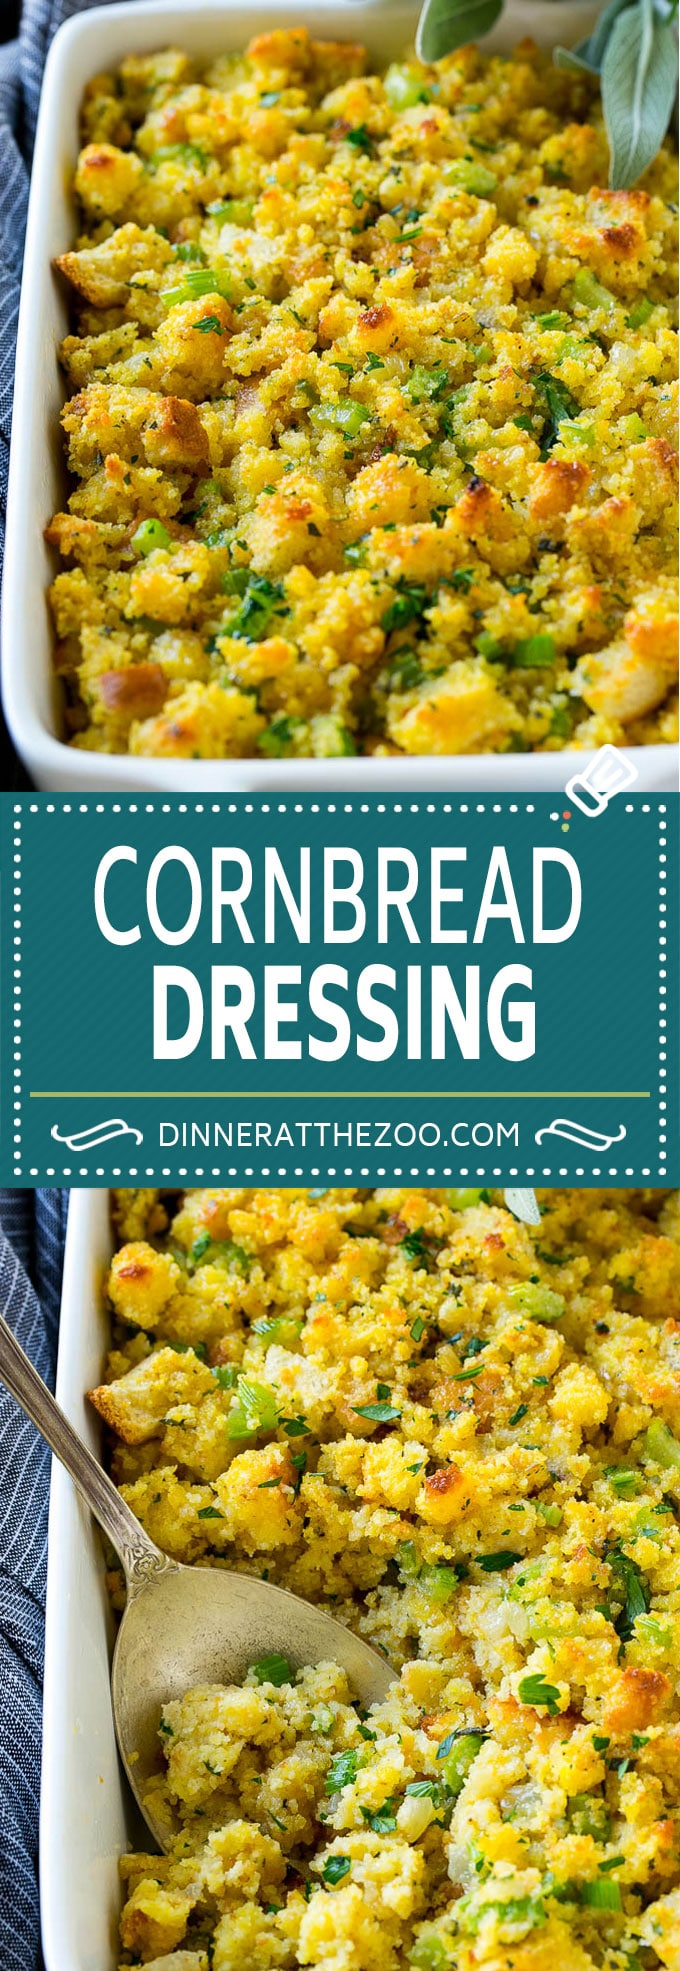 Southern Cornbread Dressing #cornbreaddressing